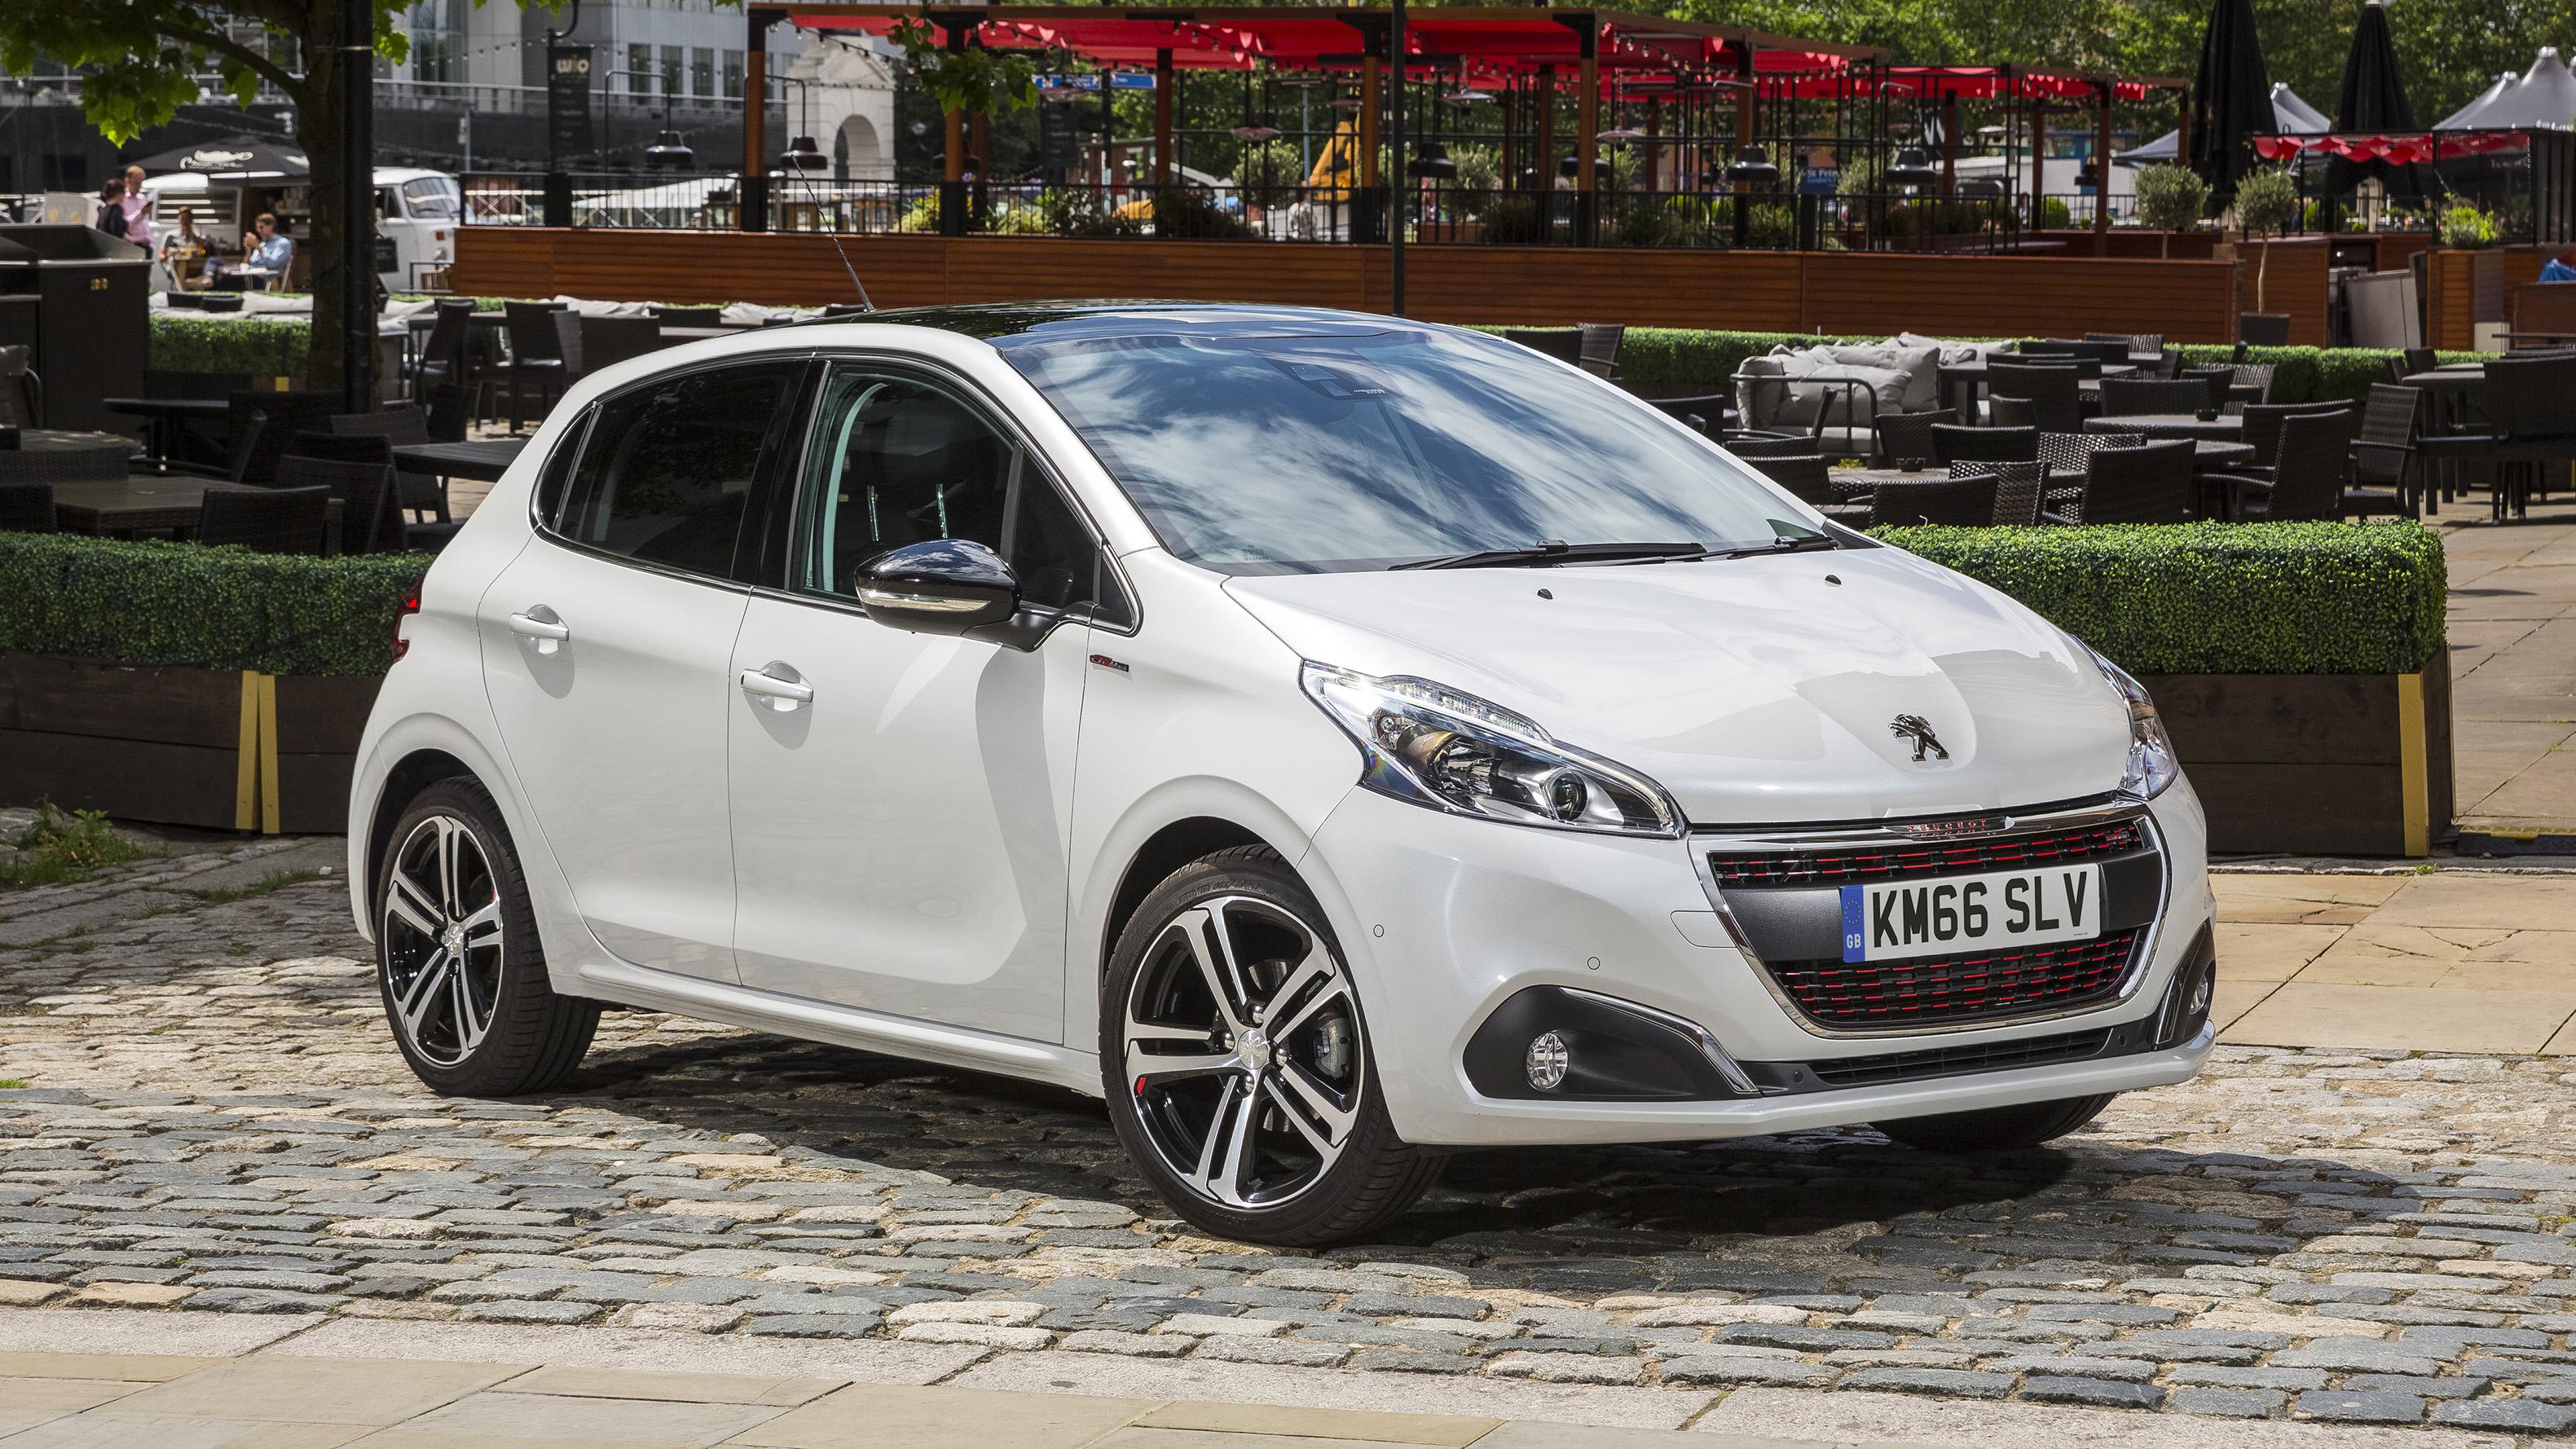 2018 Peugeot 208 Review